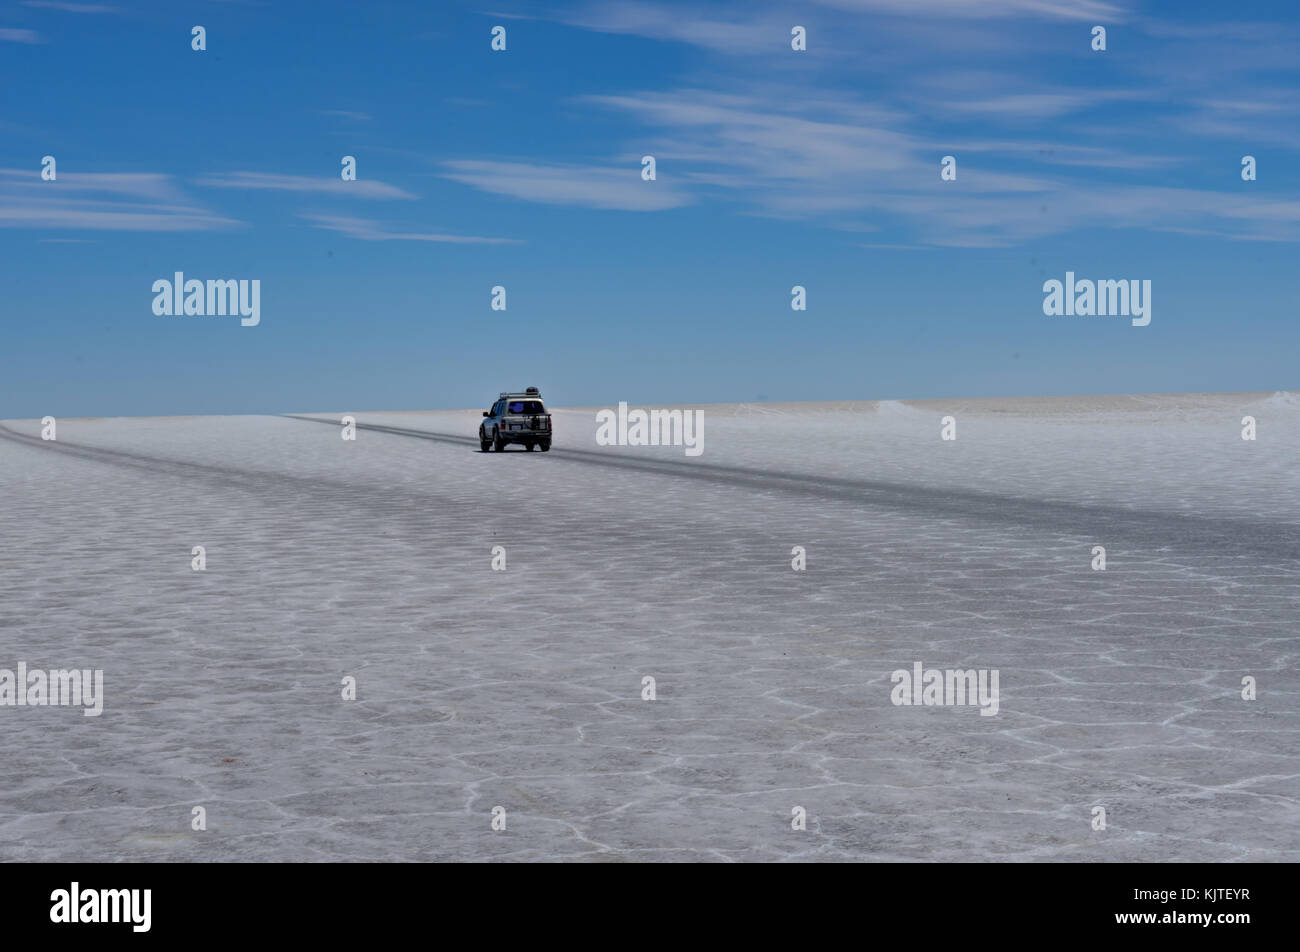 Photo taken in August 2017 in Uyuni Bolivia, South America: Jeep Tour Salt Flats in Salar de Uyuni Desert Bolivia. Stock Photo